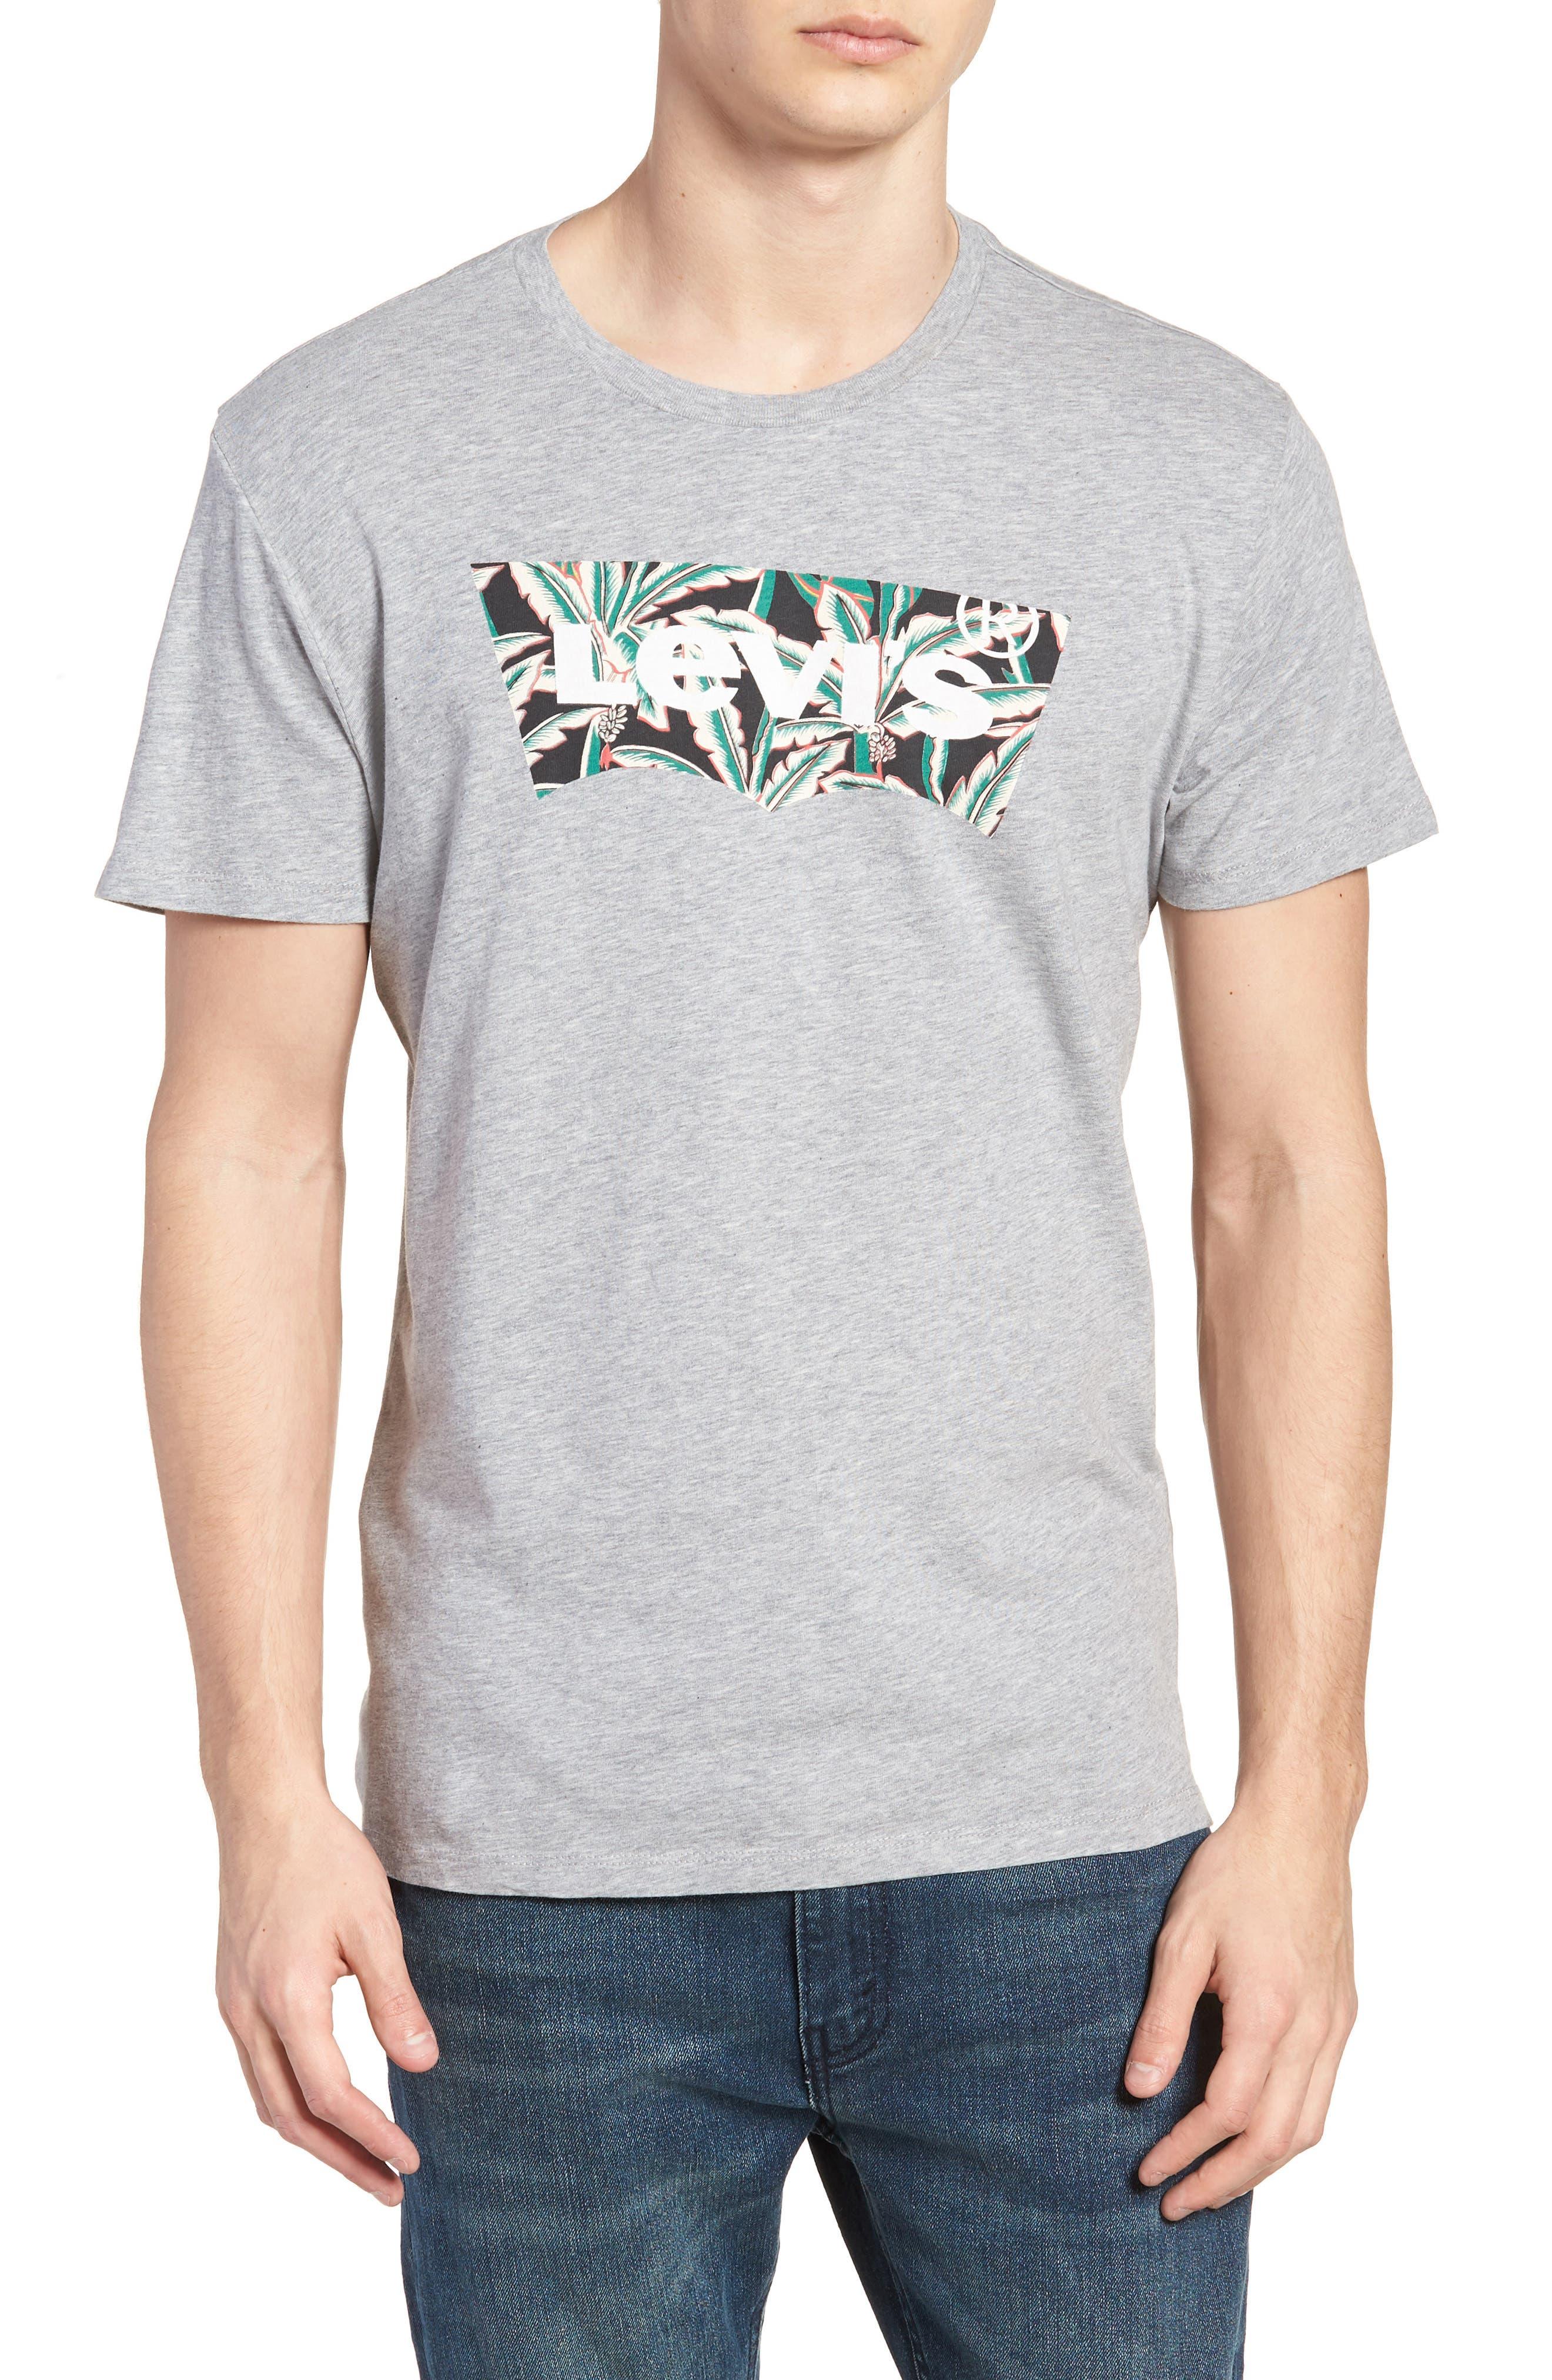 Housemark Graphic T-Shirt,                             Main thumbnail 1, color,                             020